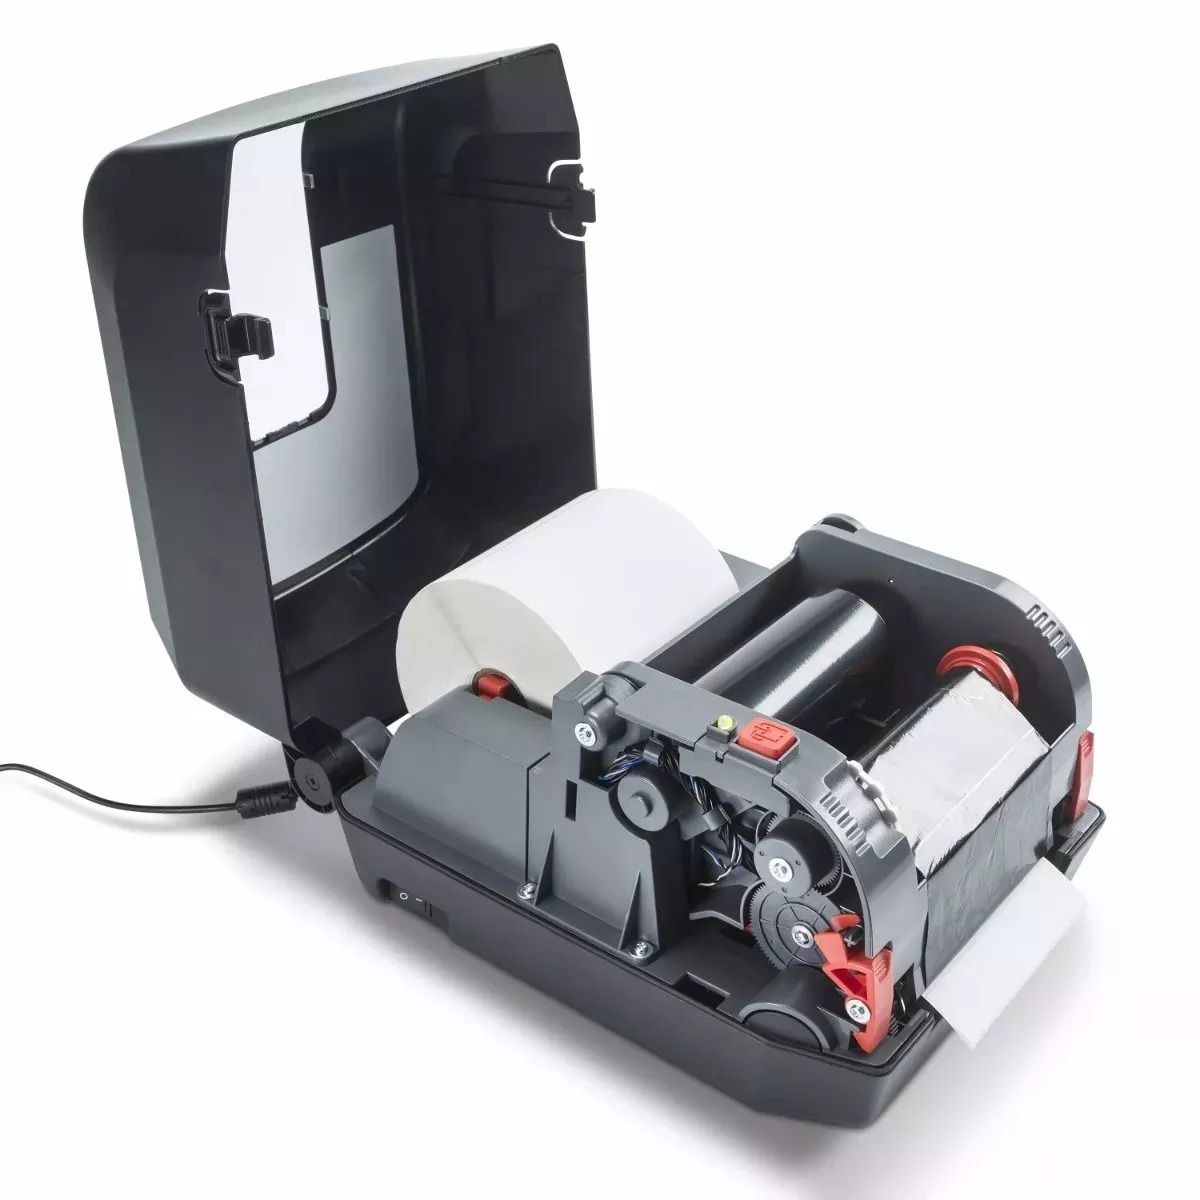 Impressora de Etiquetas Honeywell PC42t (USB)